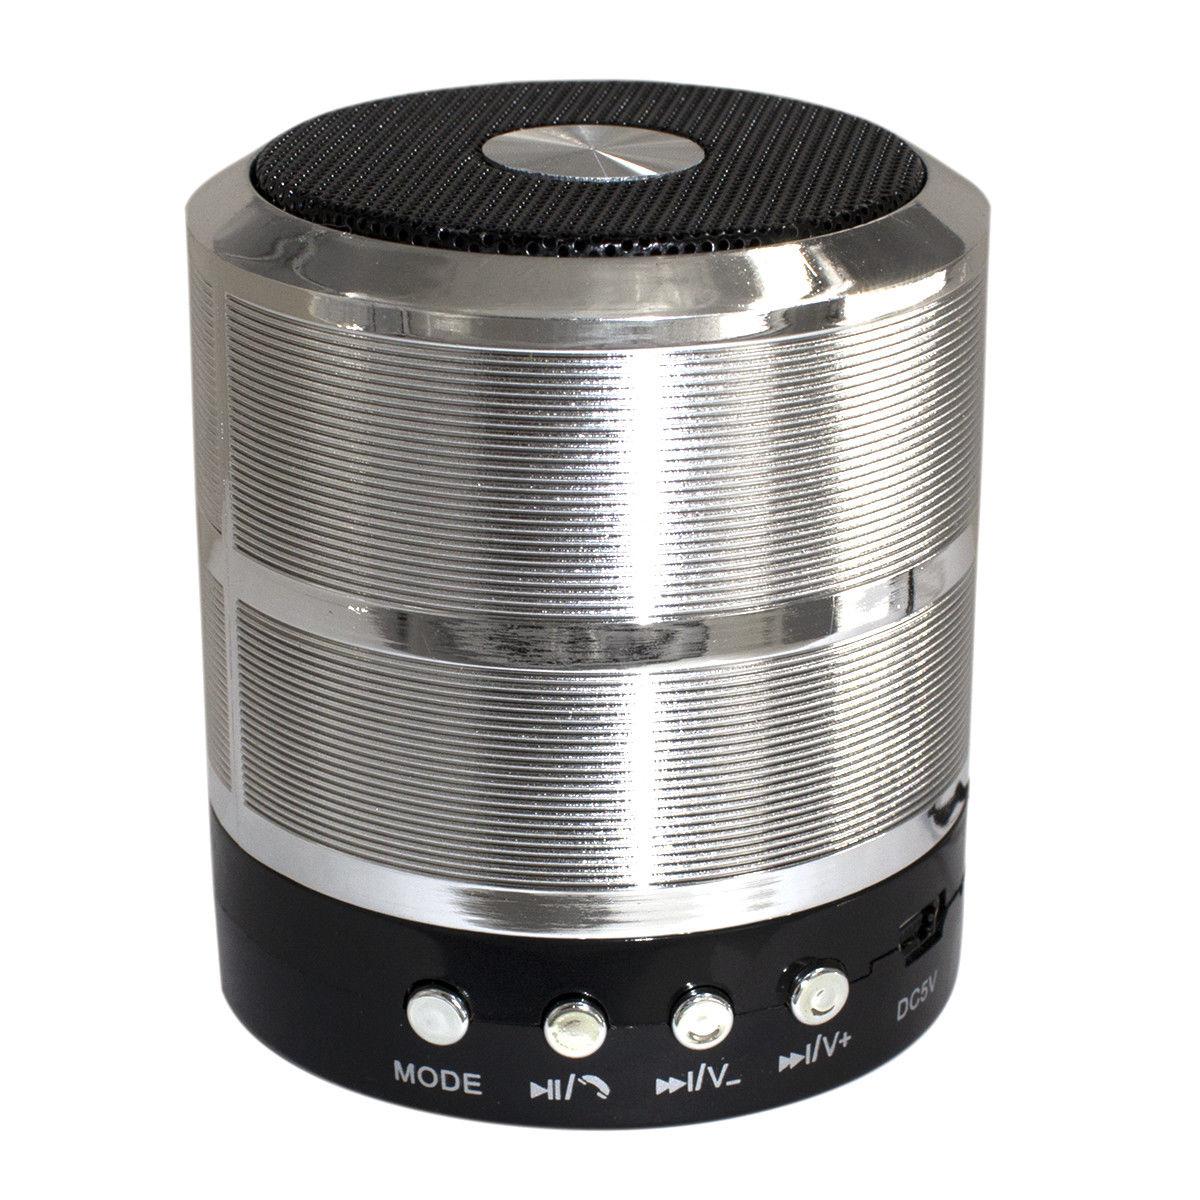 Mini Portable Bluetooth Wireless Speaker Super Bass for iPhone Samsung  Silver grey